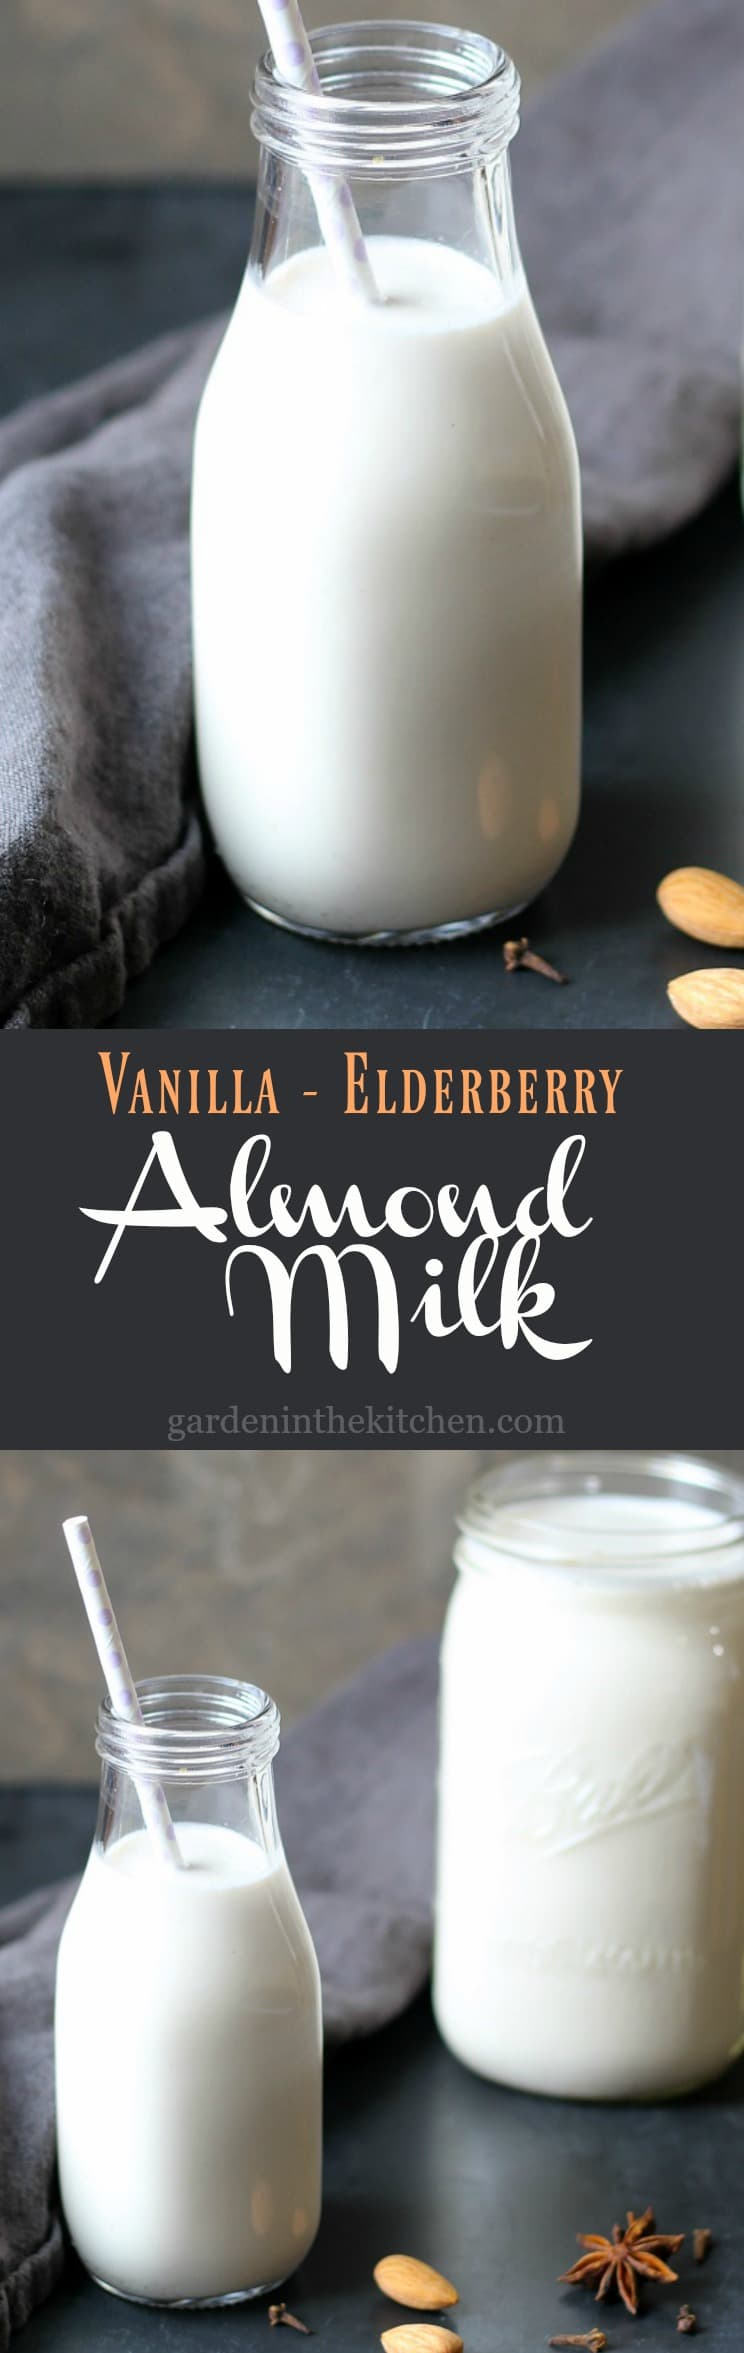 Vanilla Elderberry Infused Almond Milk | gardeninthekitchen.com